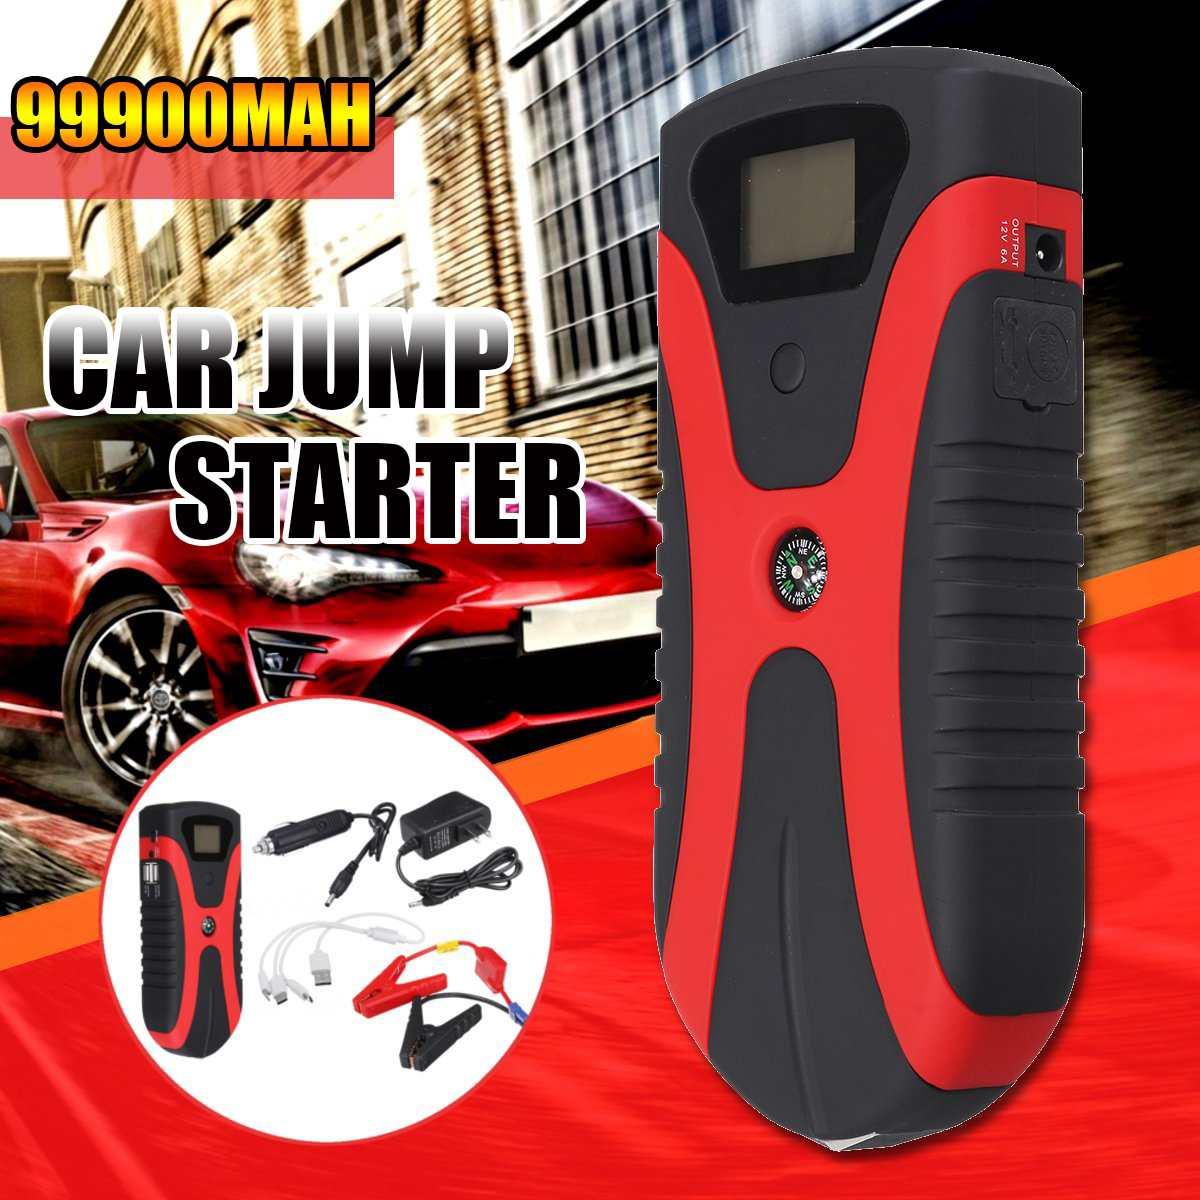 180A Tragbare Multi Funktion Power Auto Starthilfe Notfall Licht Tragbare Auto Batterie Booster Ladegerät Mit USB schnelle lade